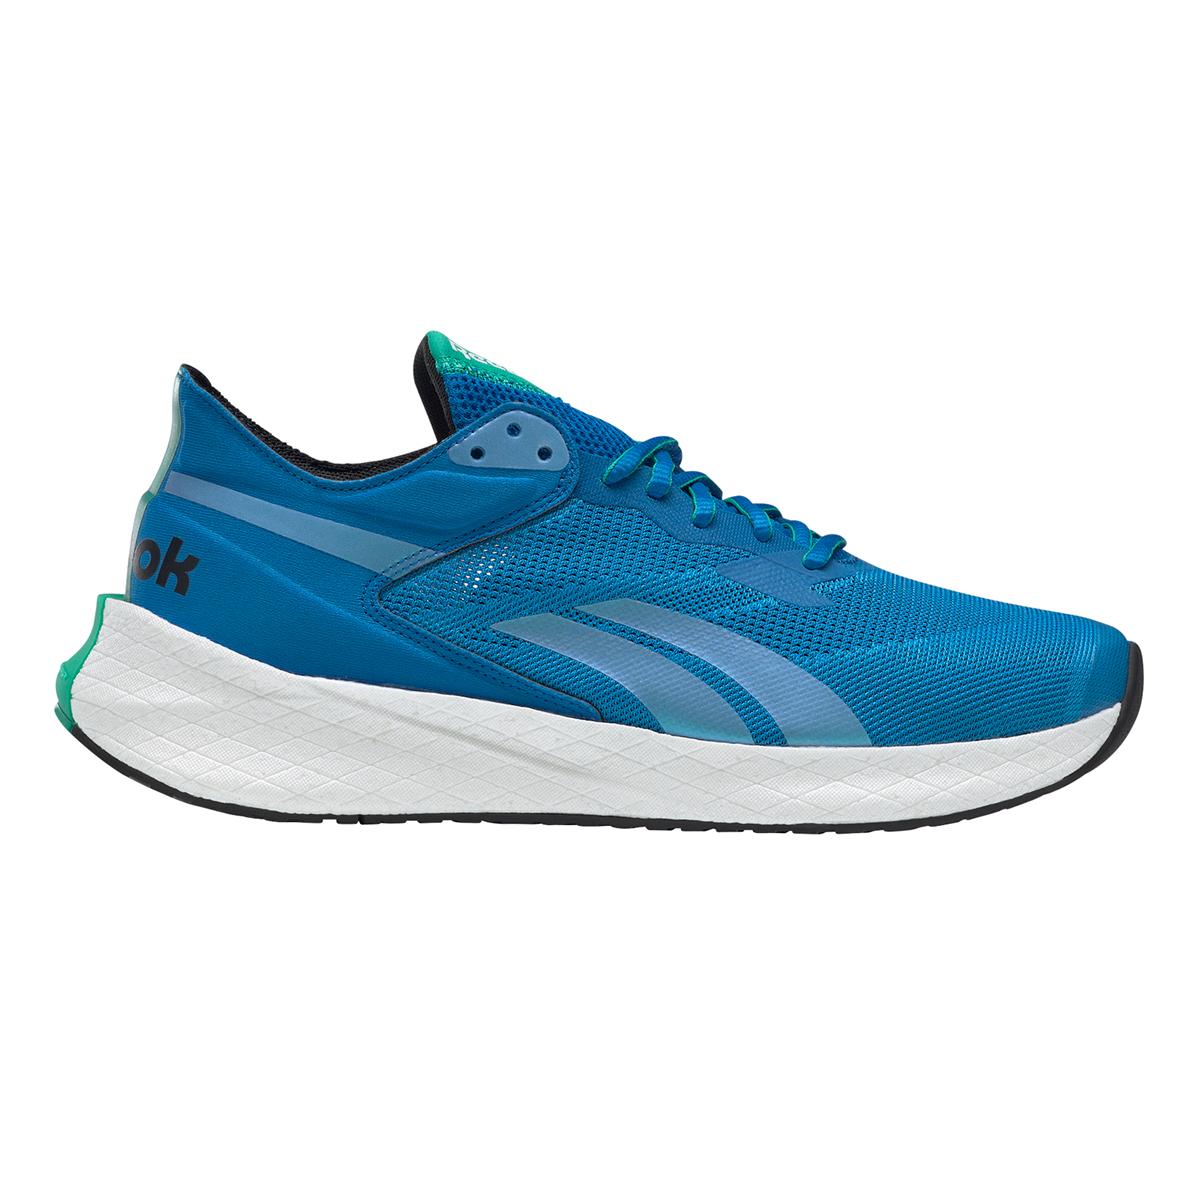 Men's Reebok Floatride Energy Symmetros Running Shoe - Color: Dynamic Blue/Horizon Blue/Court Green - Size: 7 - Width: Regular, Dynamic Blue/Horizon Blue/Court Green, large, image 1